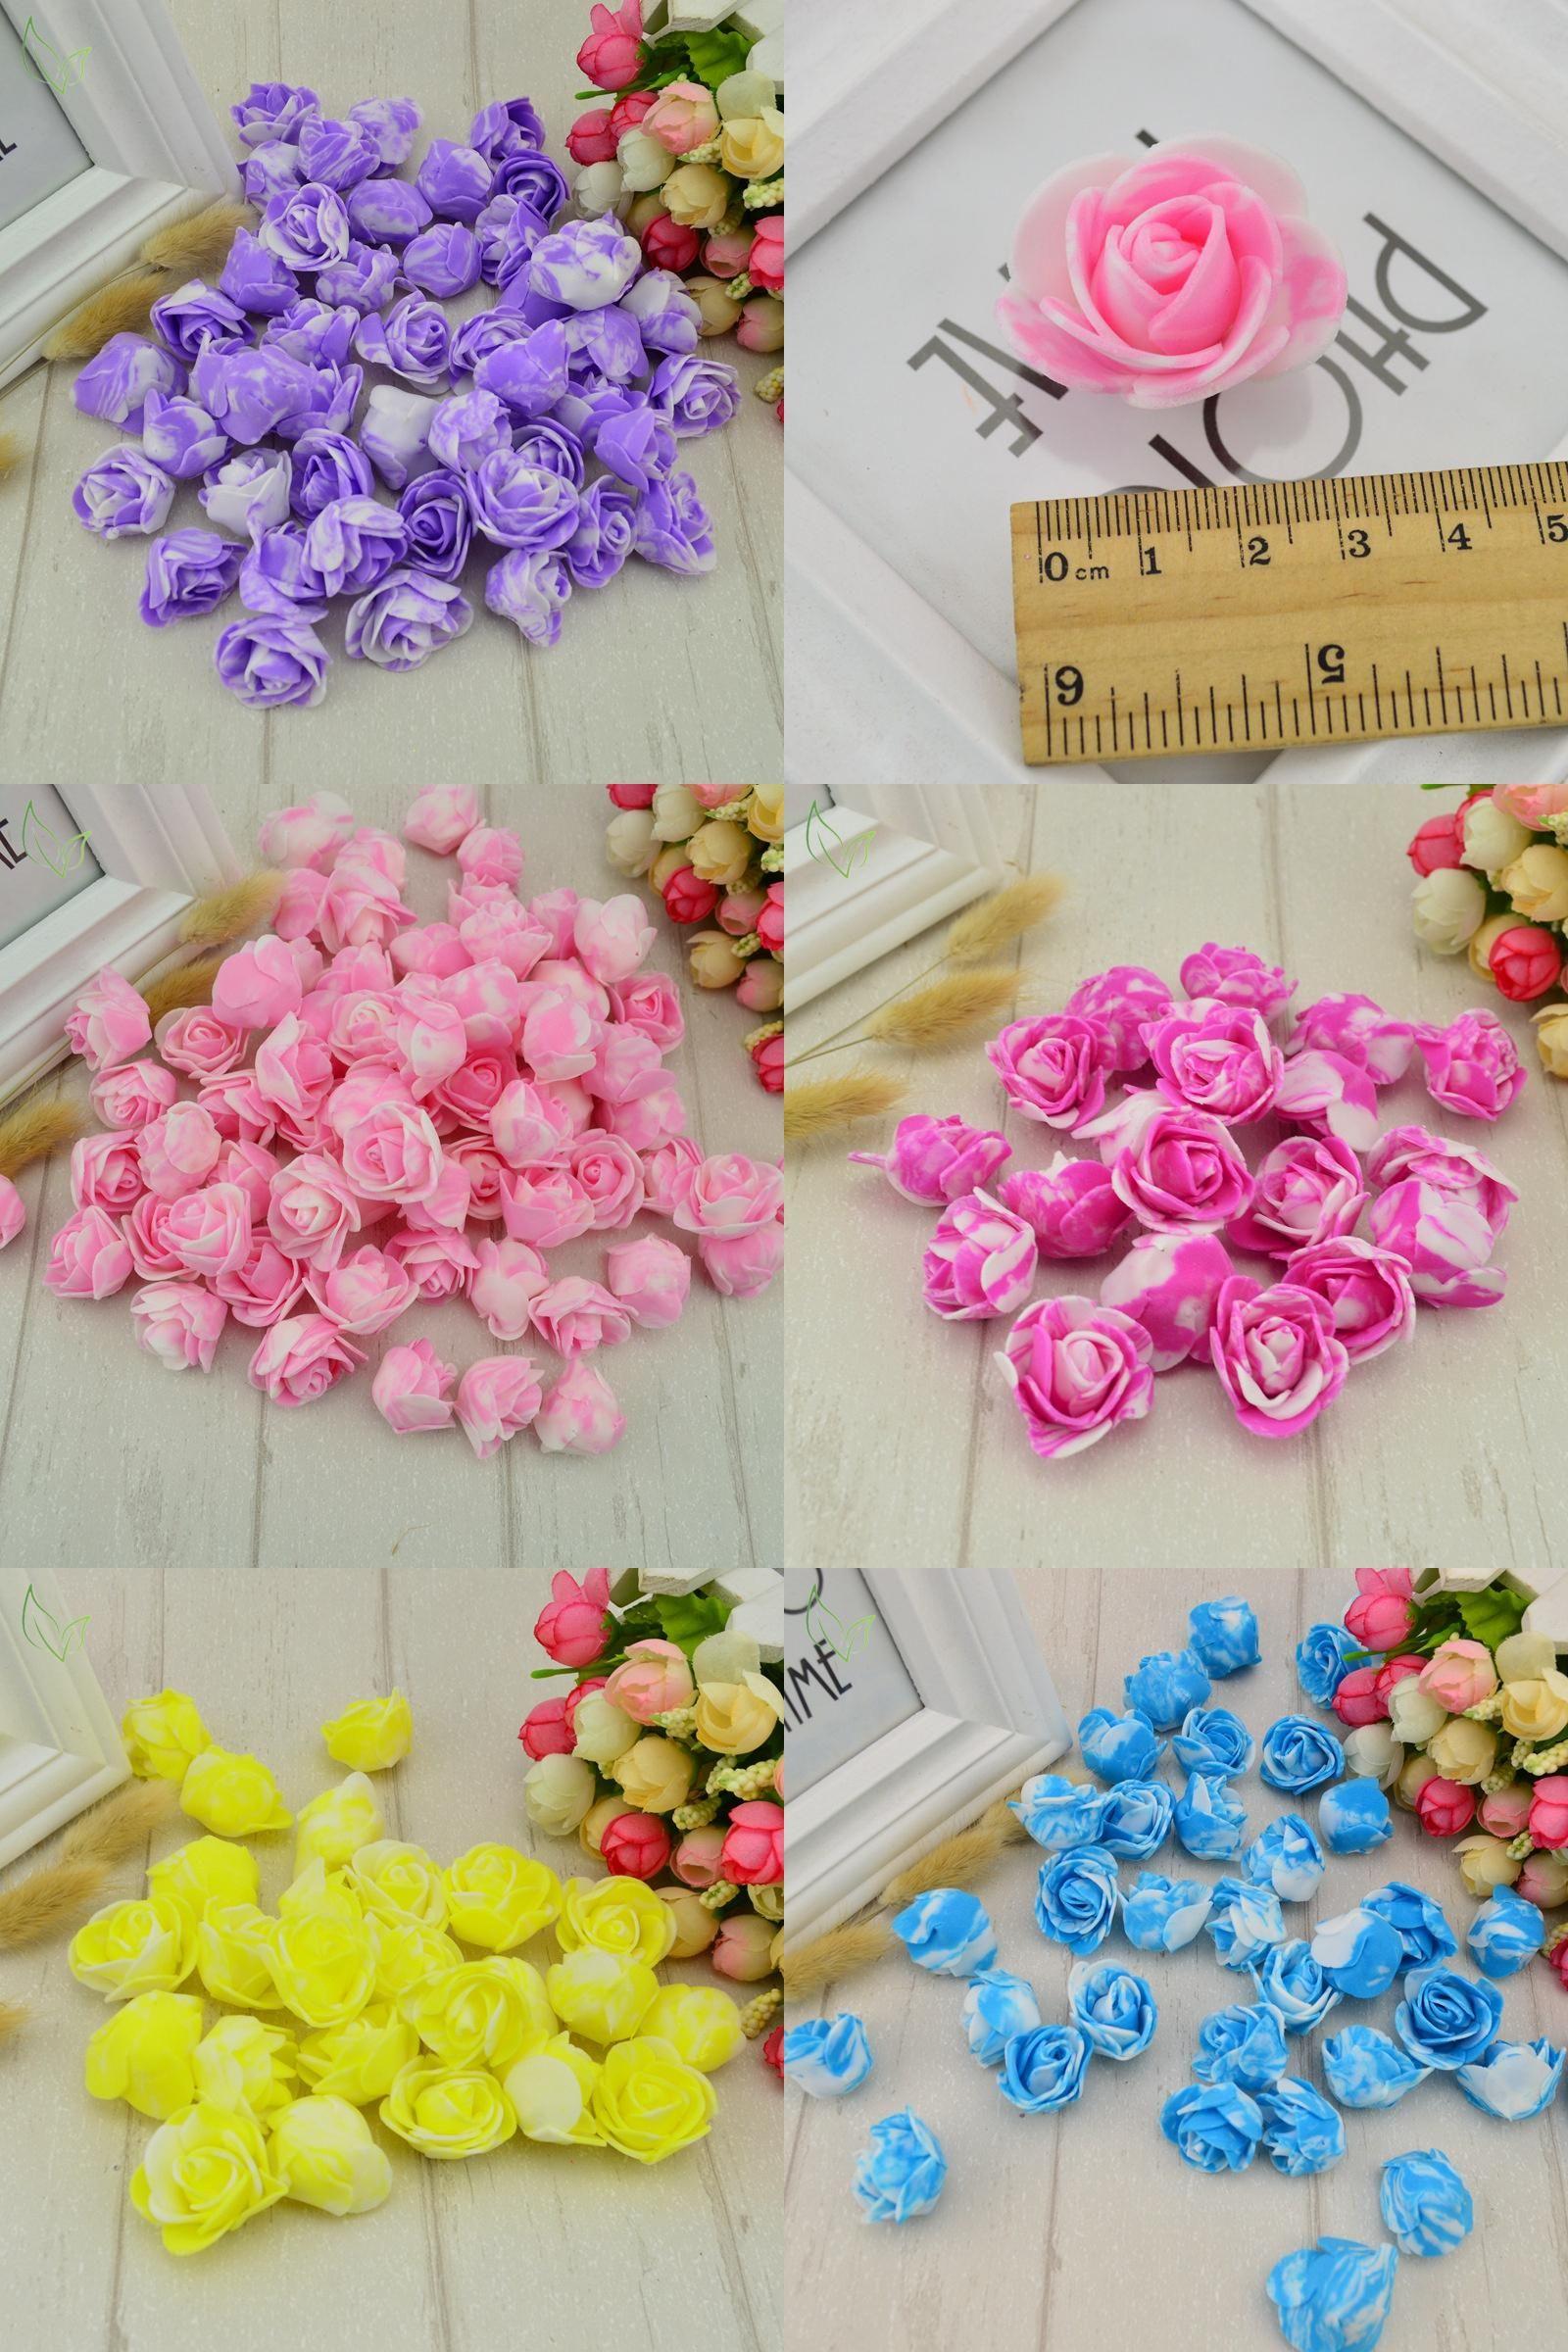 Visit to Buy] 30 pcs PE Foam fake flower roses head artificial ...